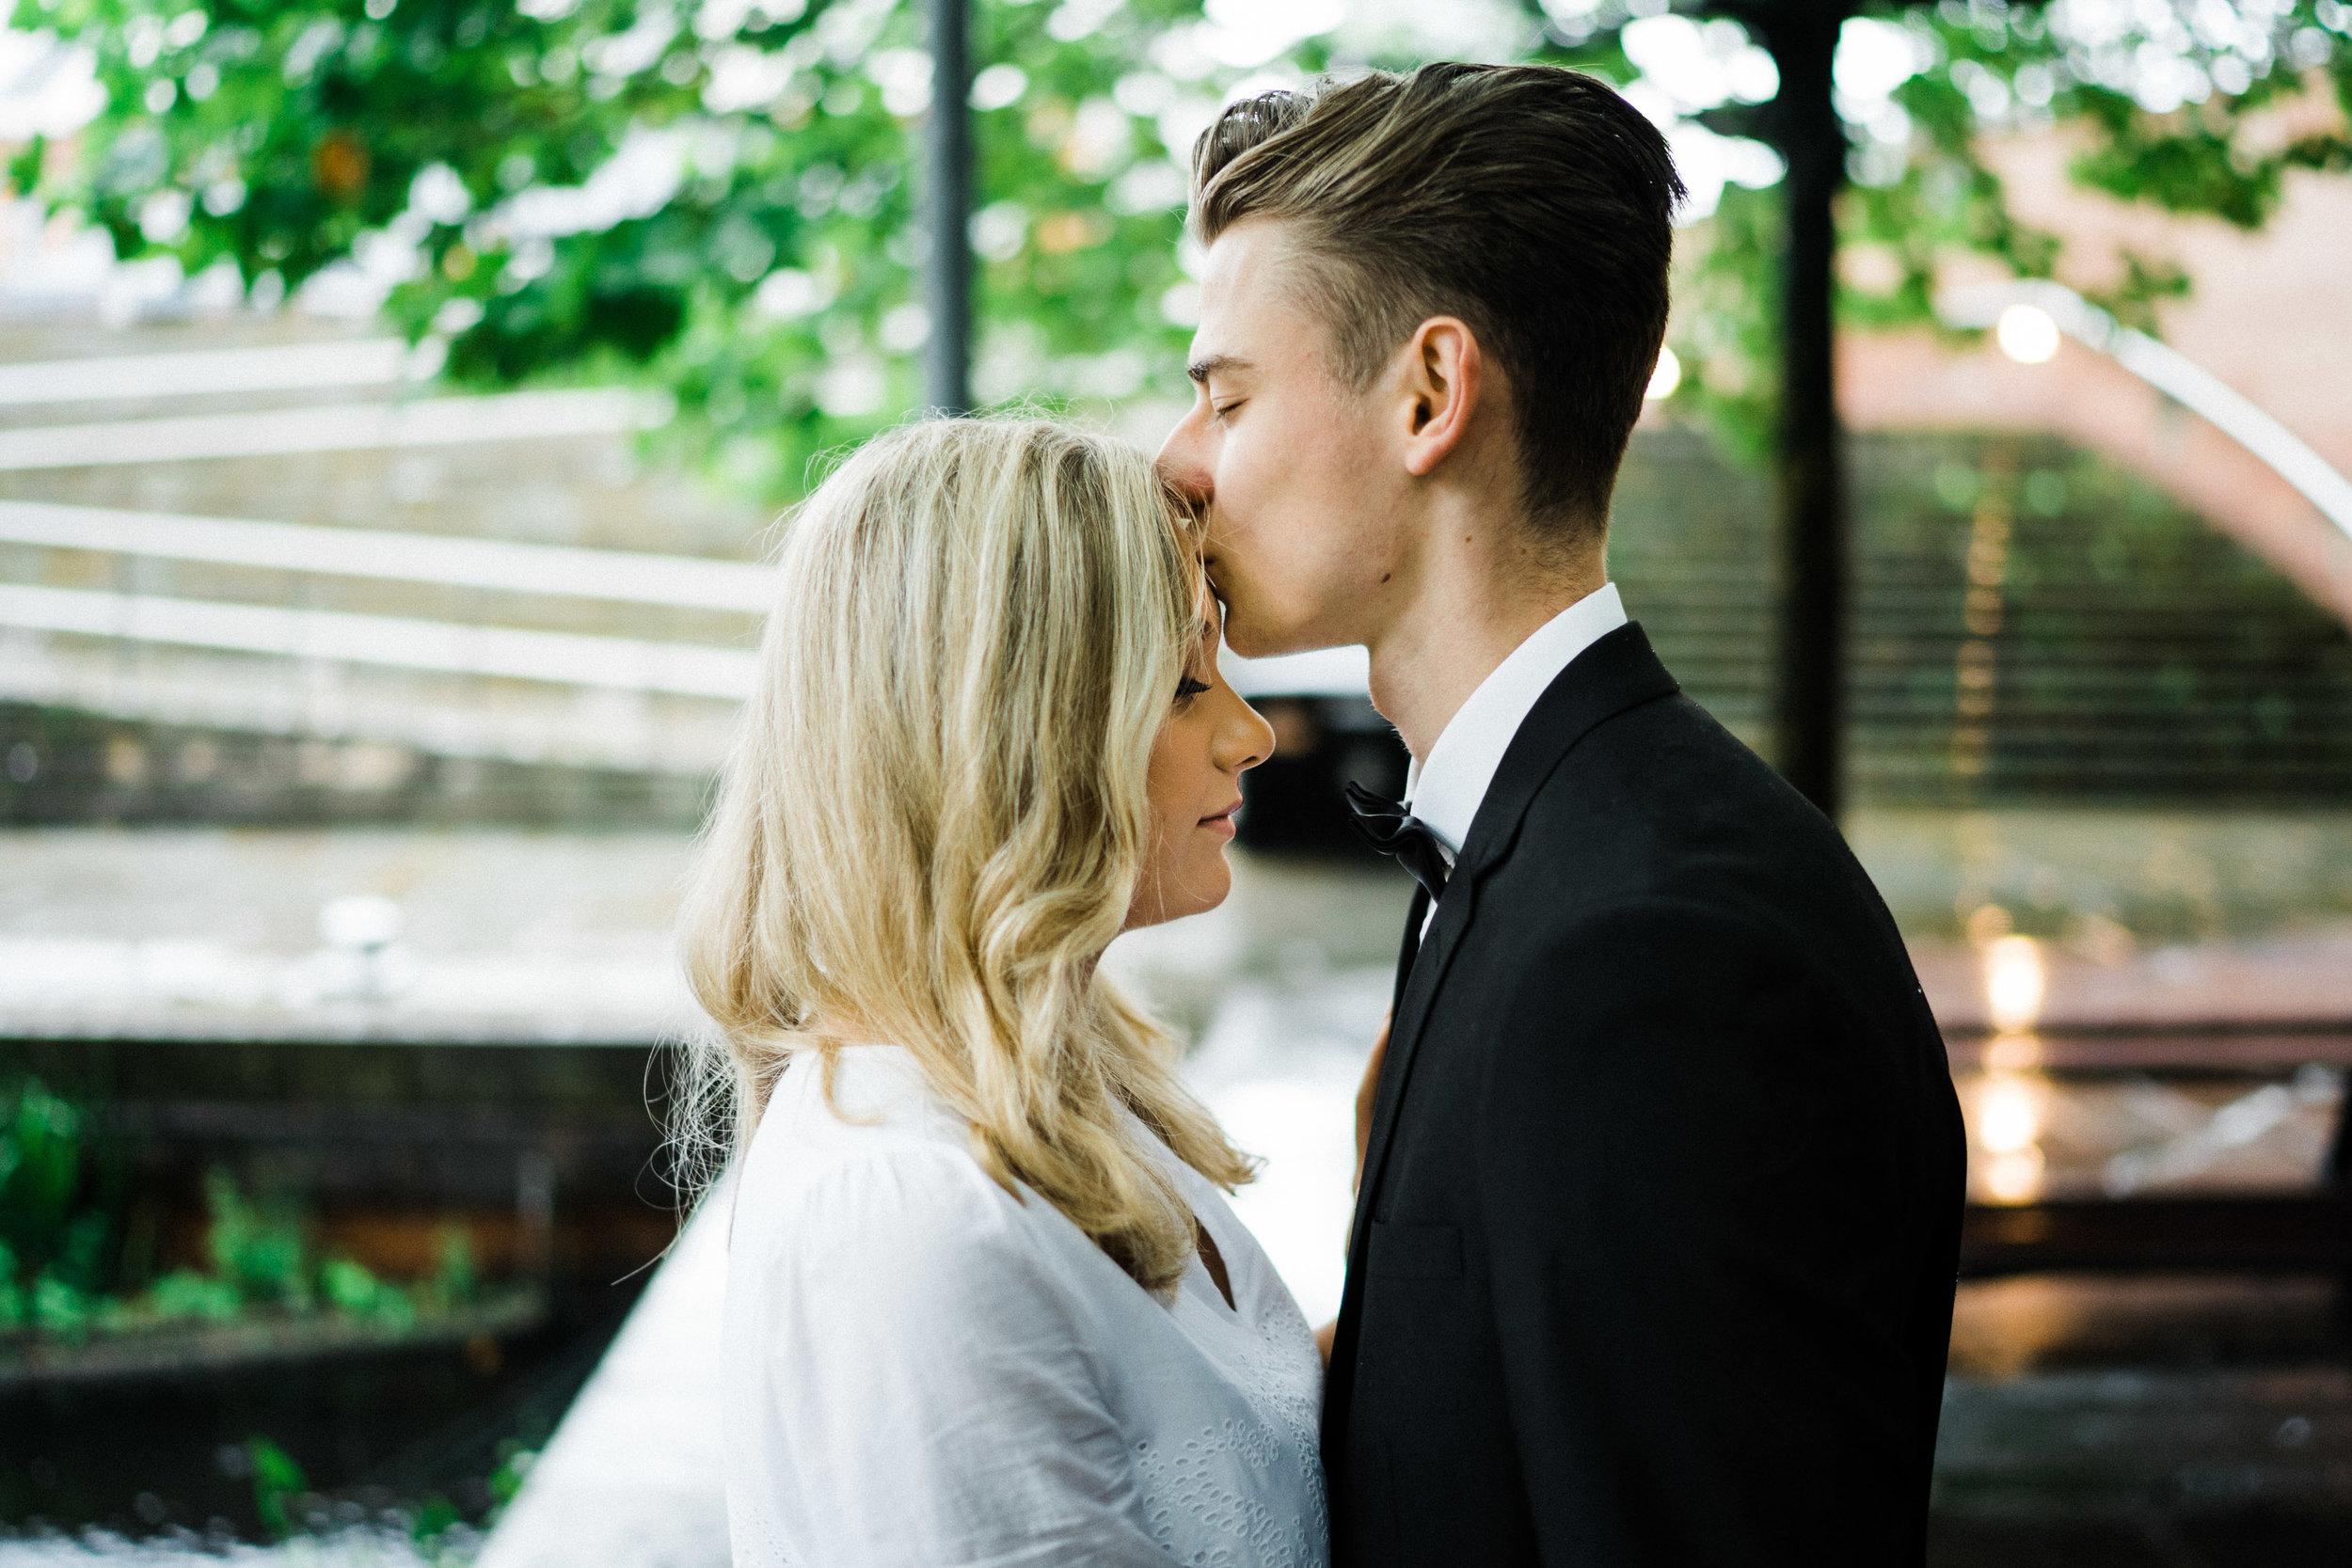 www.bytomw.com - Tom Wright - Manchester & Lake District Wedding Photographer -01016.jpg